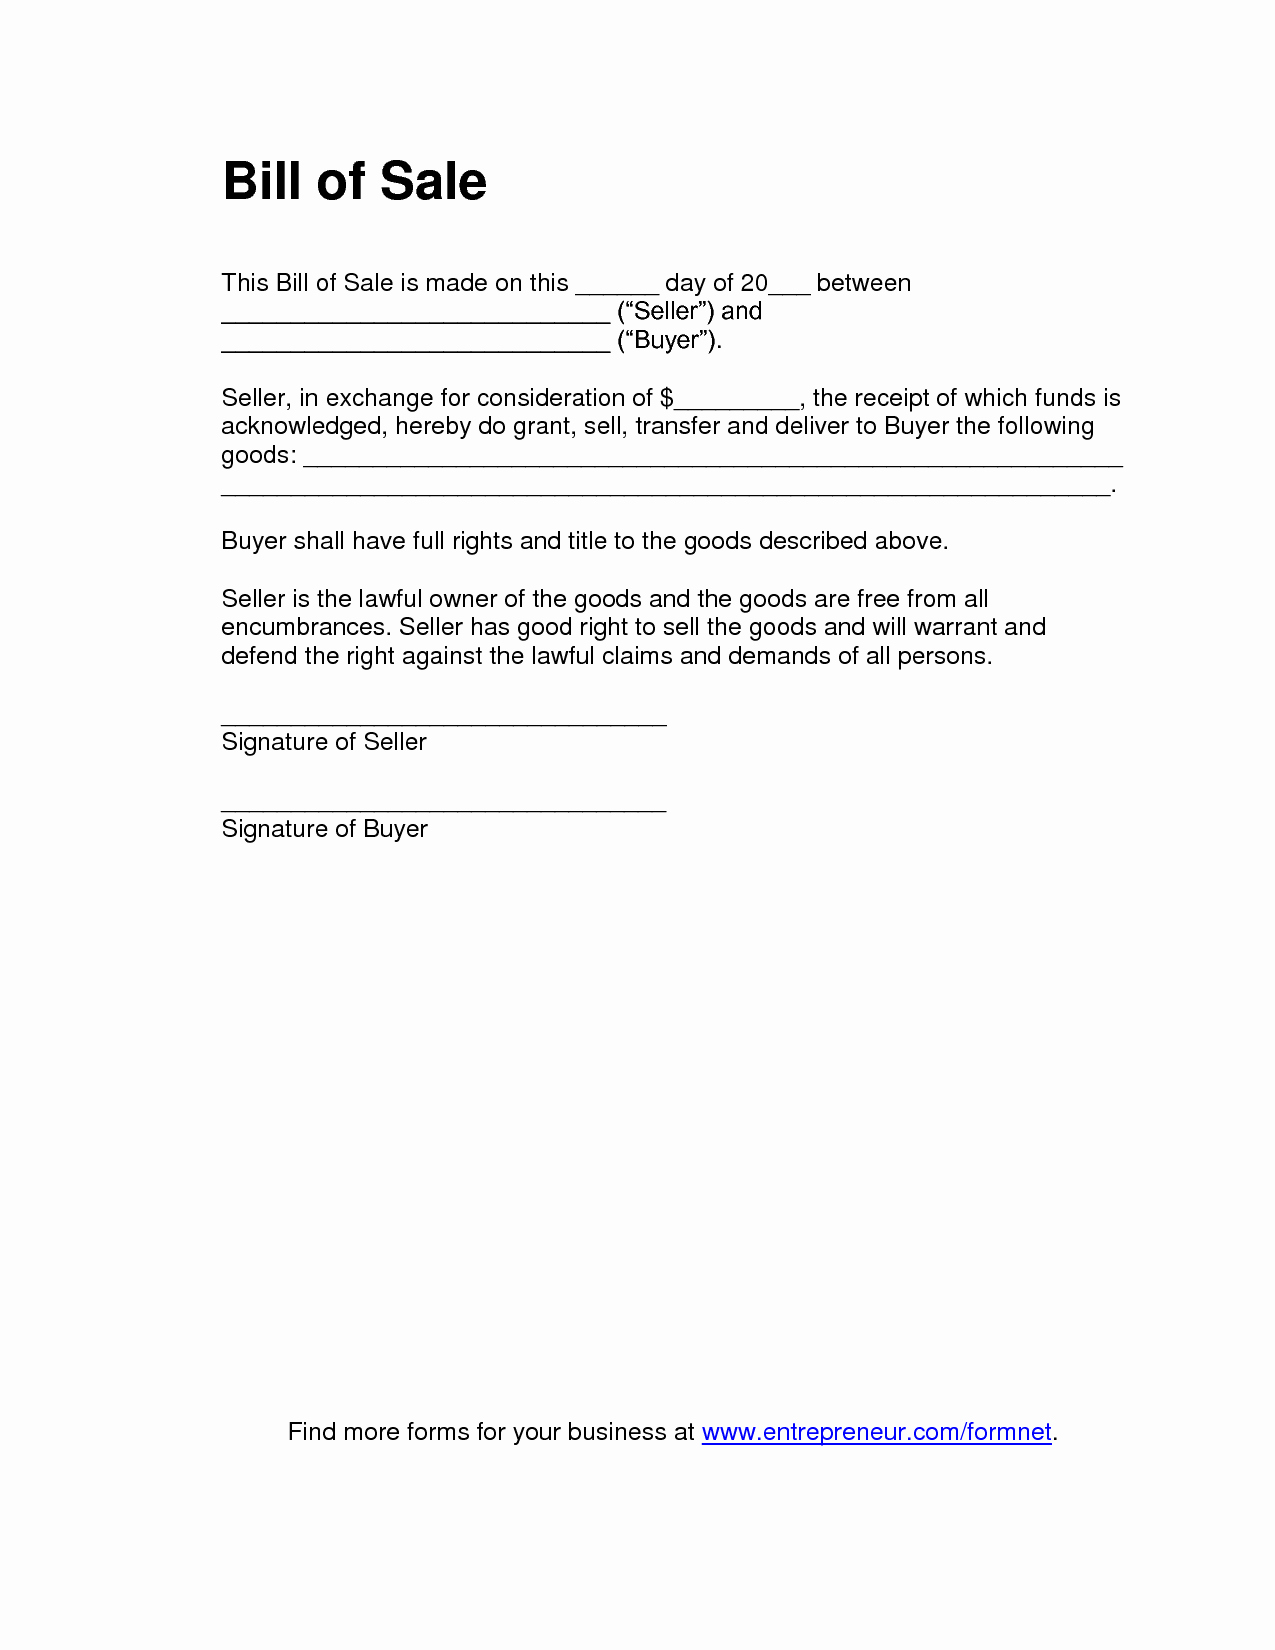 Bill Of Sale Printable Template Inspirational Free Printable Bill Of Sale Templates form Generic